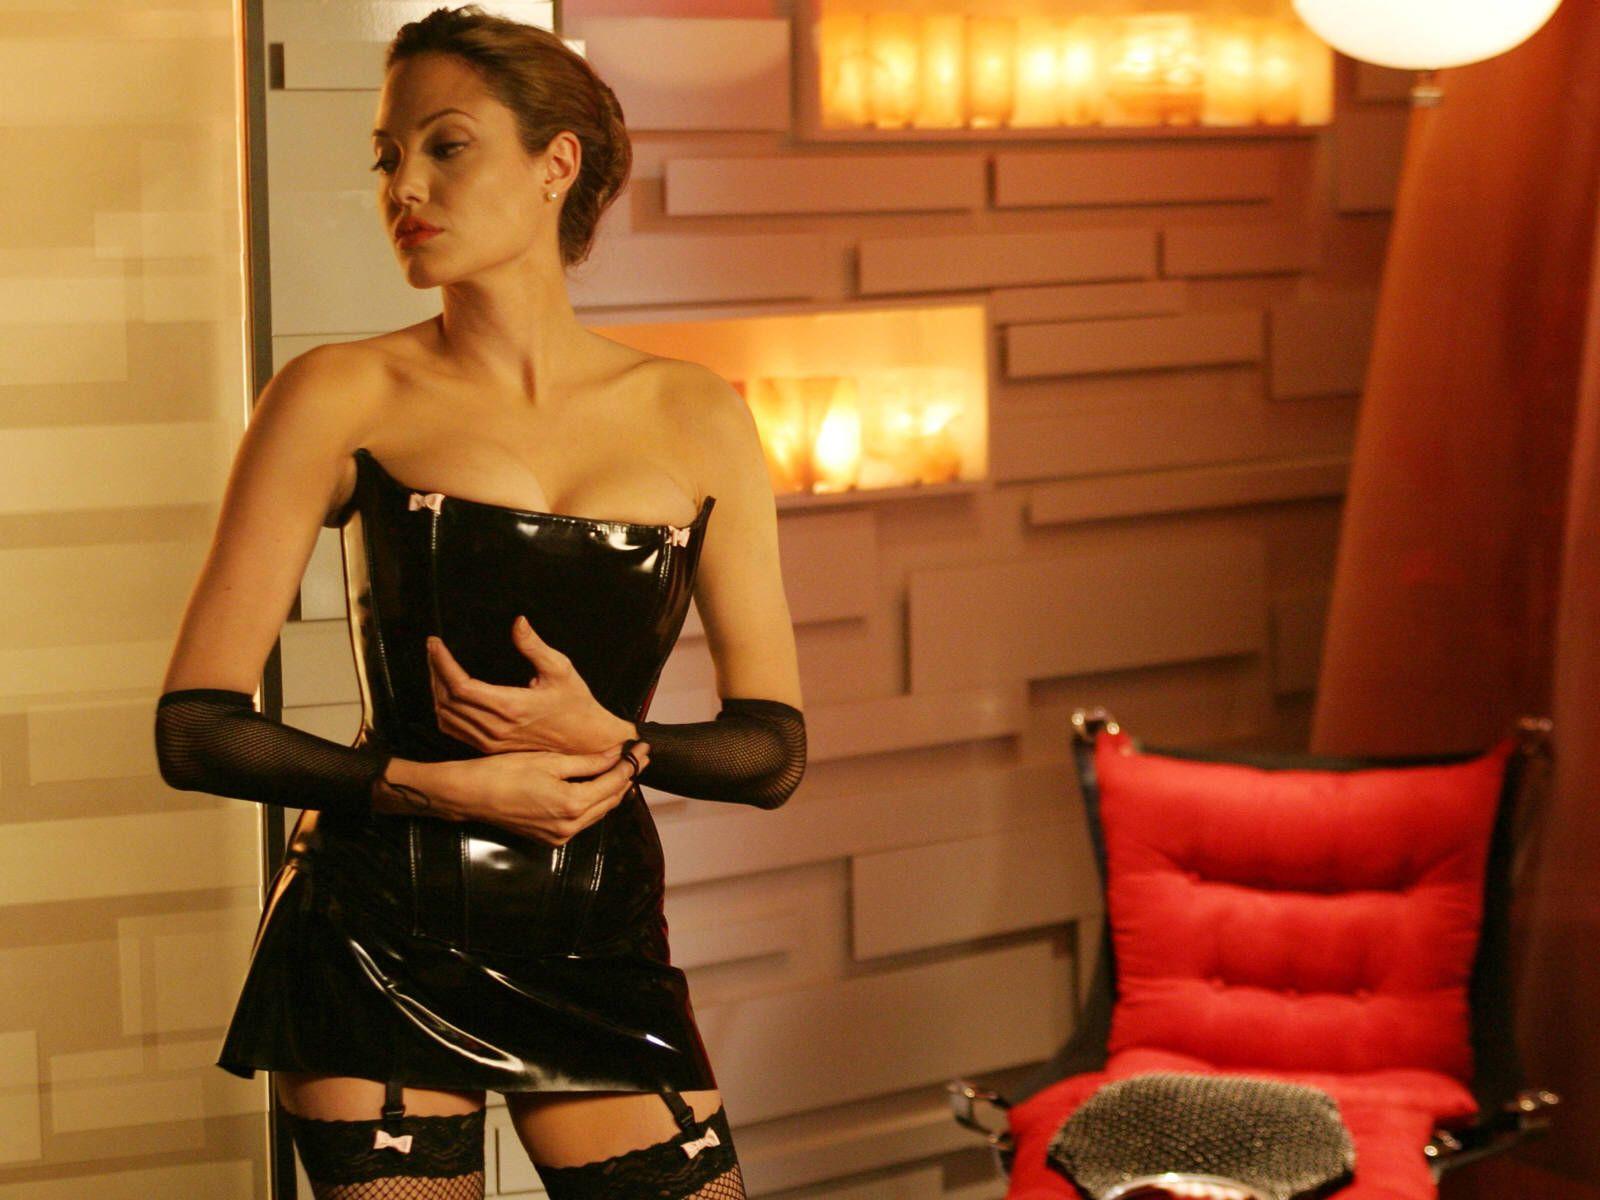 http://2.bp.blogspot.com/-J040t7Au9A0/UJ_UsIyZwRI/AAAAAAAABfA/lUHtNeNVTEE/s1600/Angelina_Jolie_5.jpg